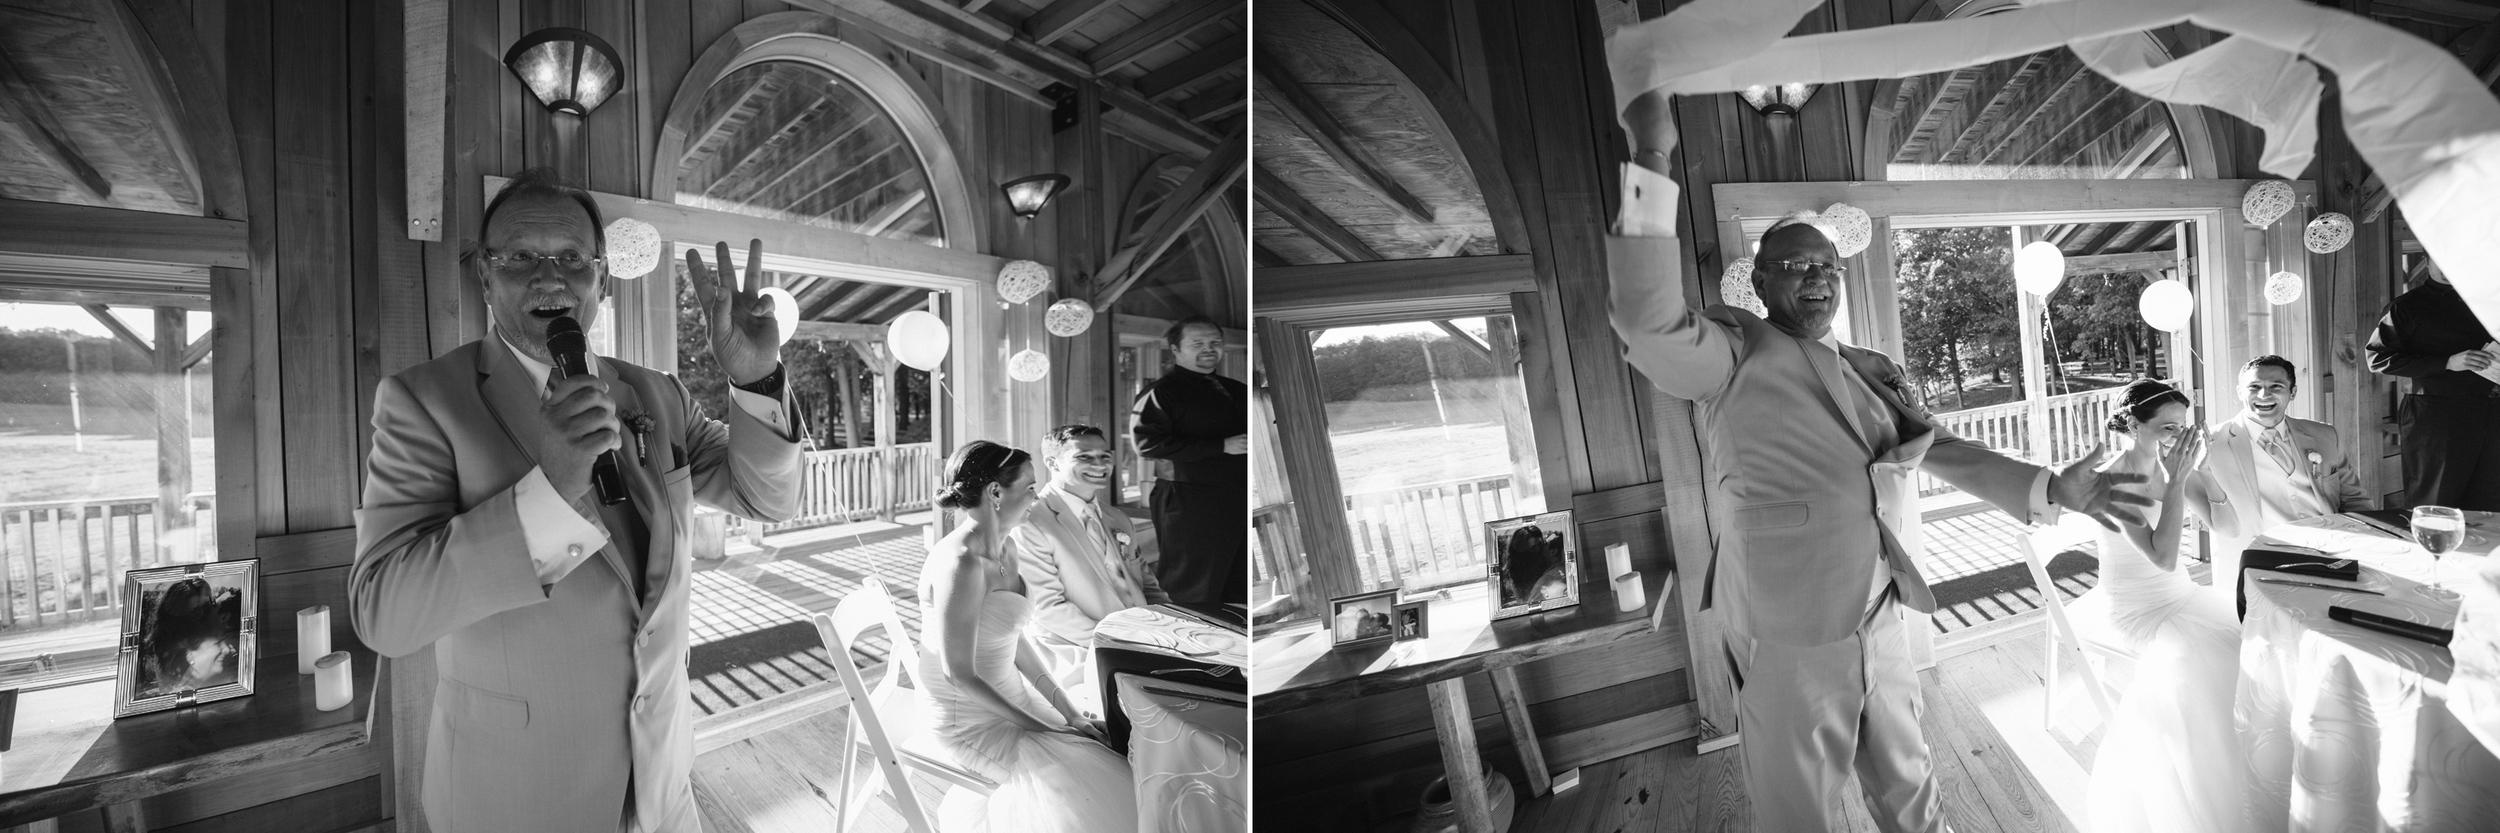 Matt_Swetel_Photography_Erin_and_Jeff_married043.jpg